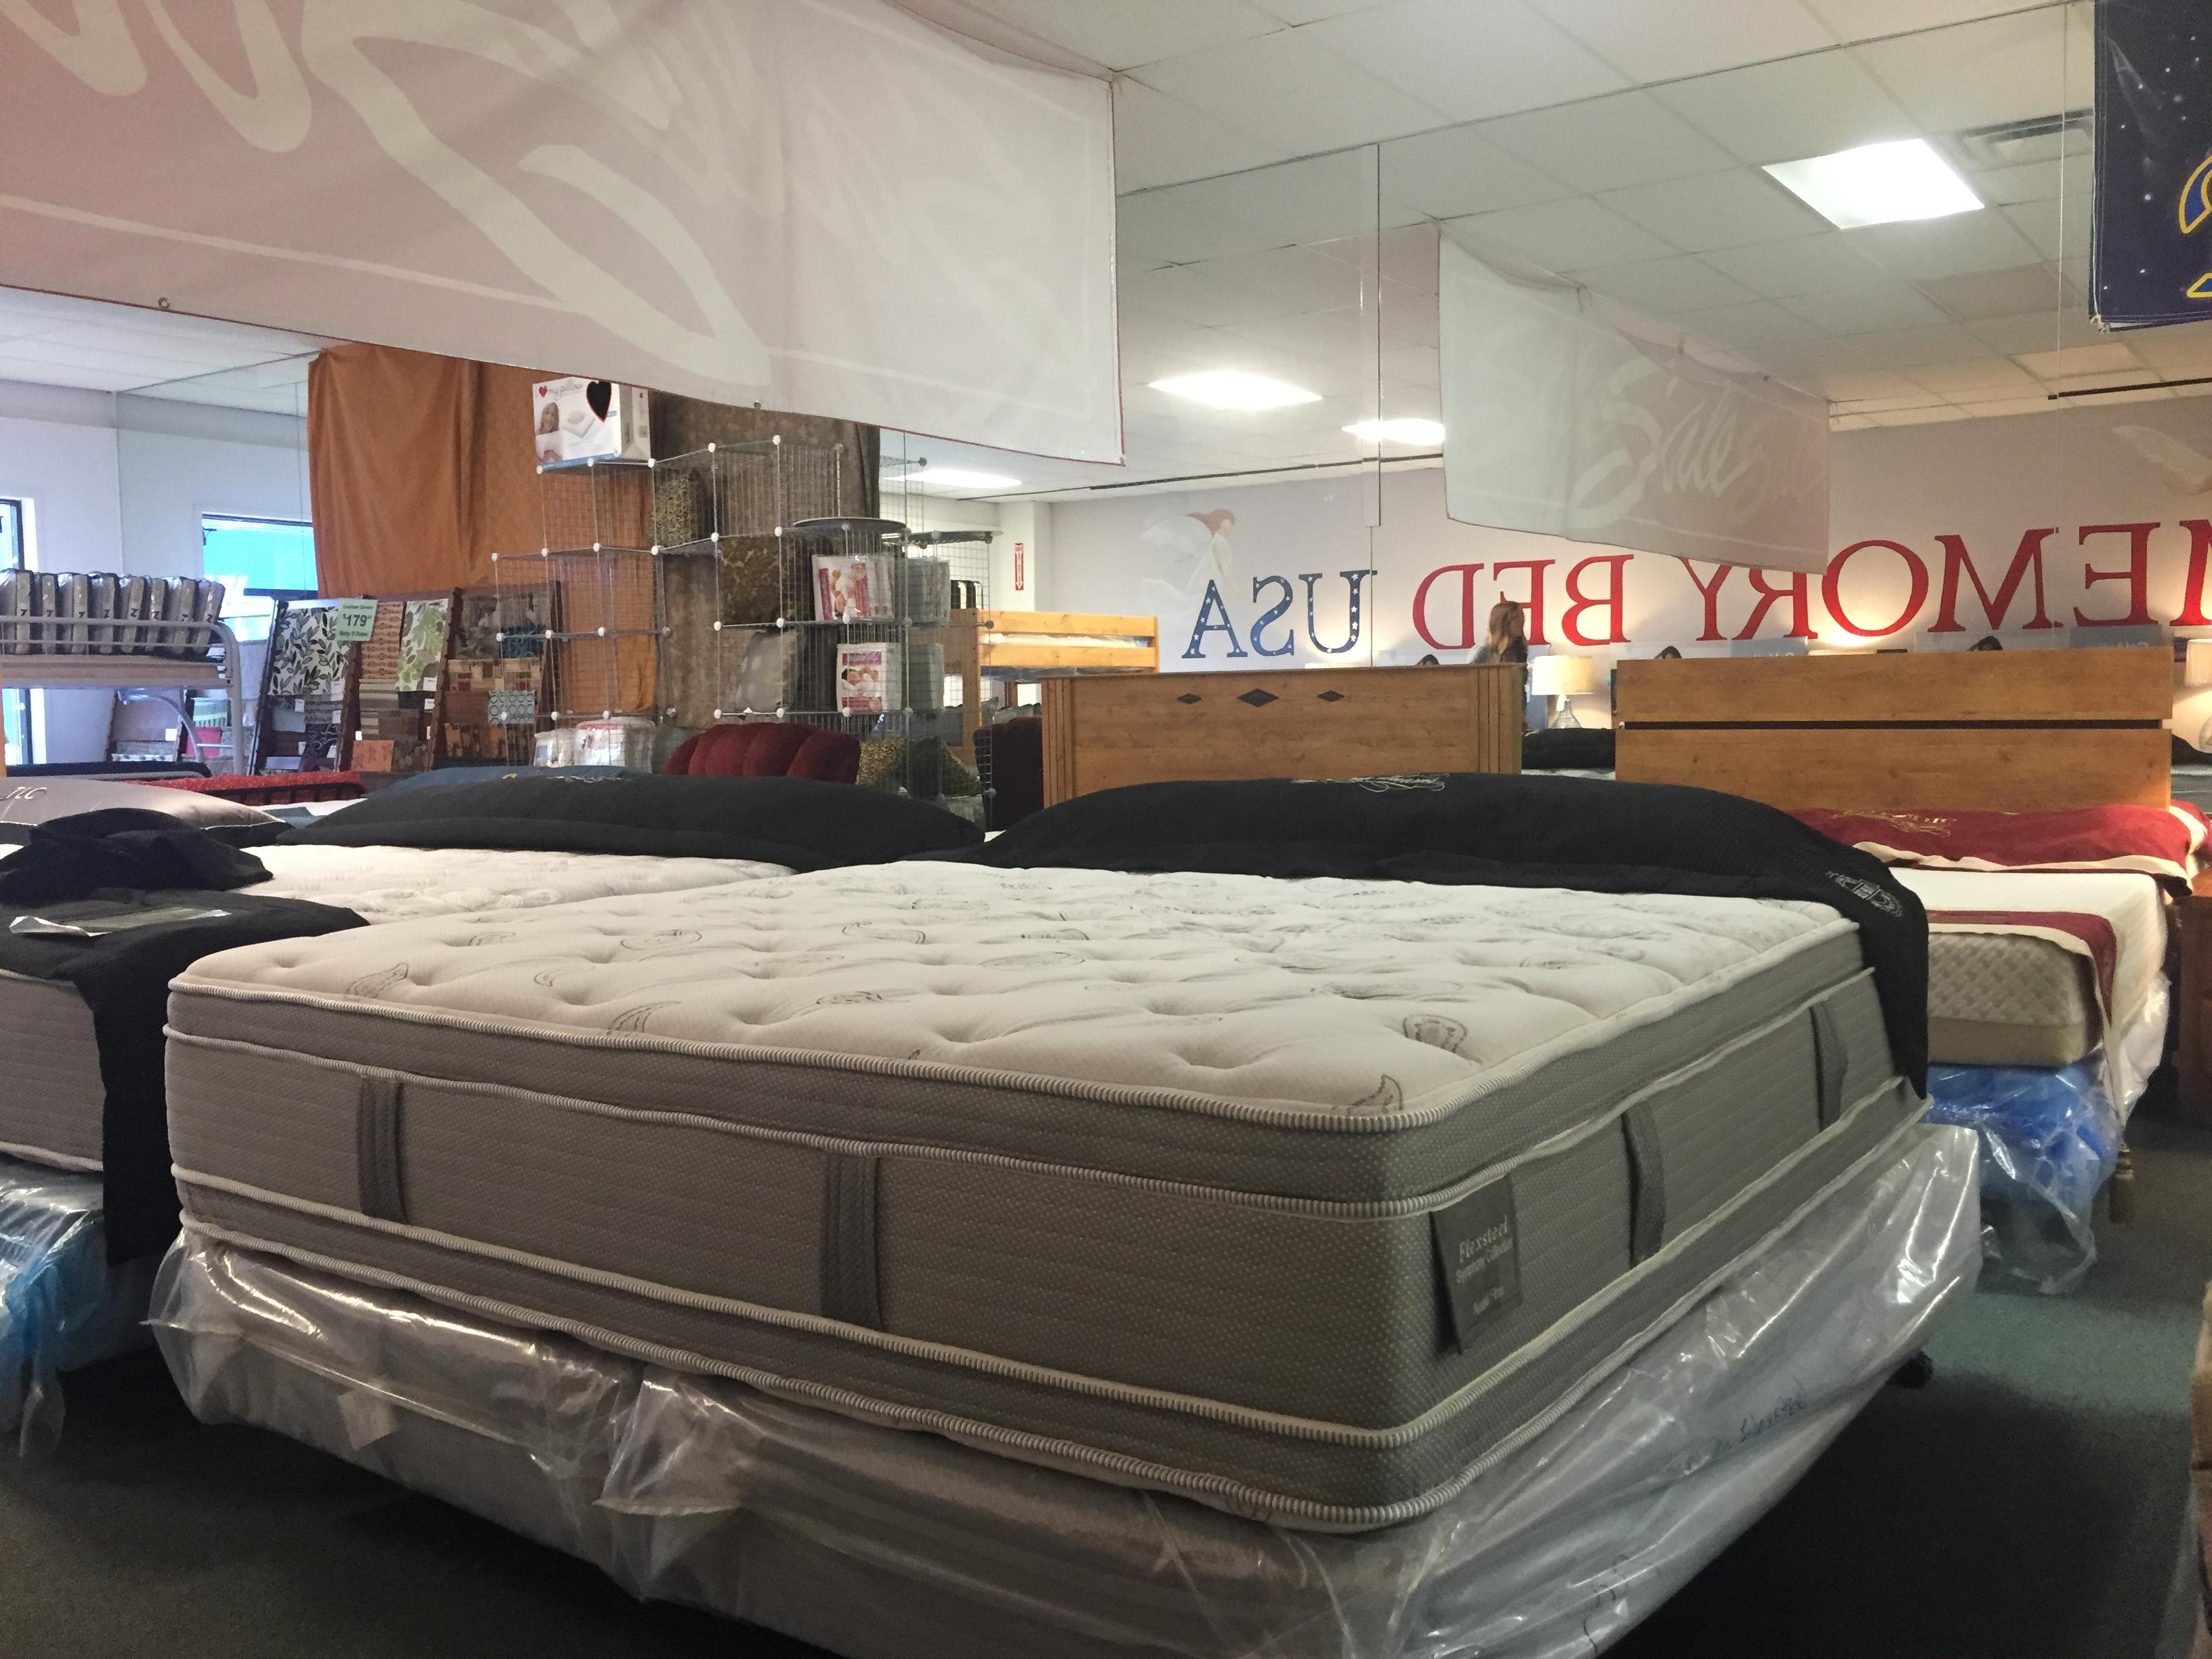 Mattress Stores Mattress Sale – Genesee County East